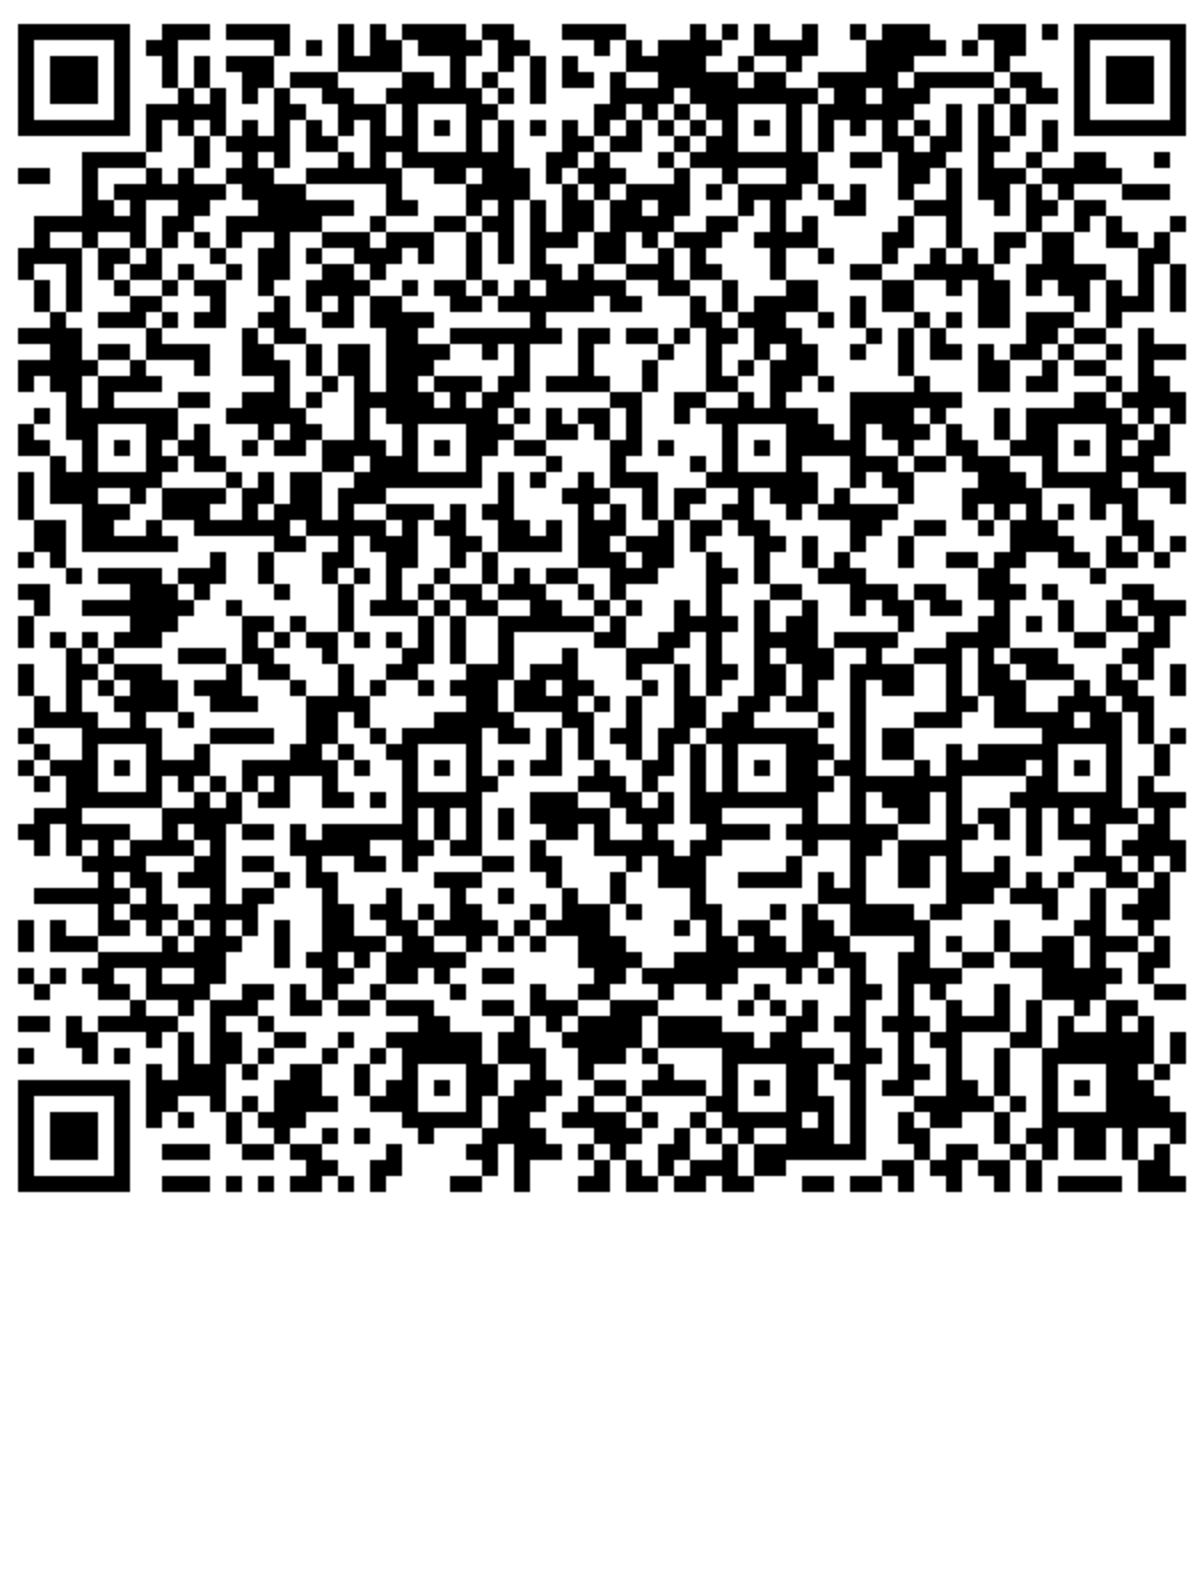 6EF0693A-CB83-46E2-A5AE-4854FD2A07D4